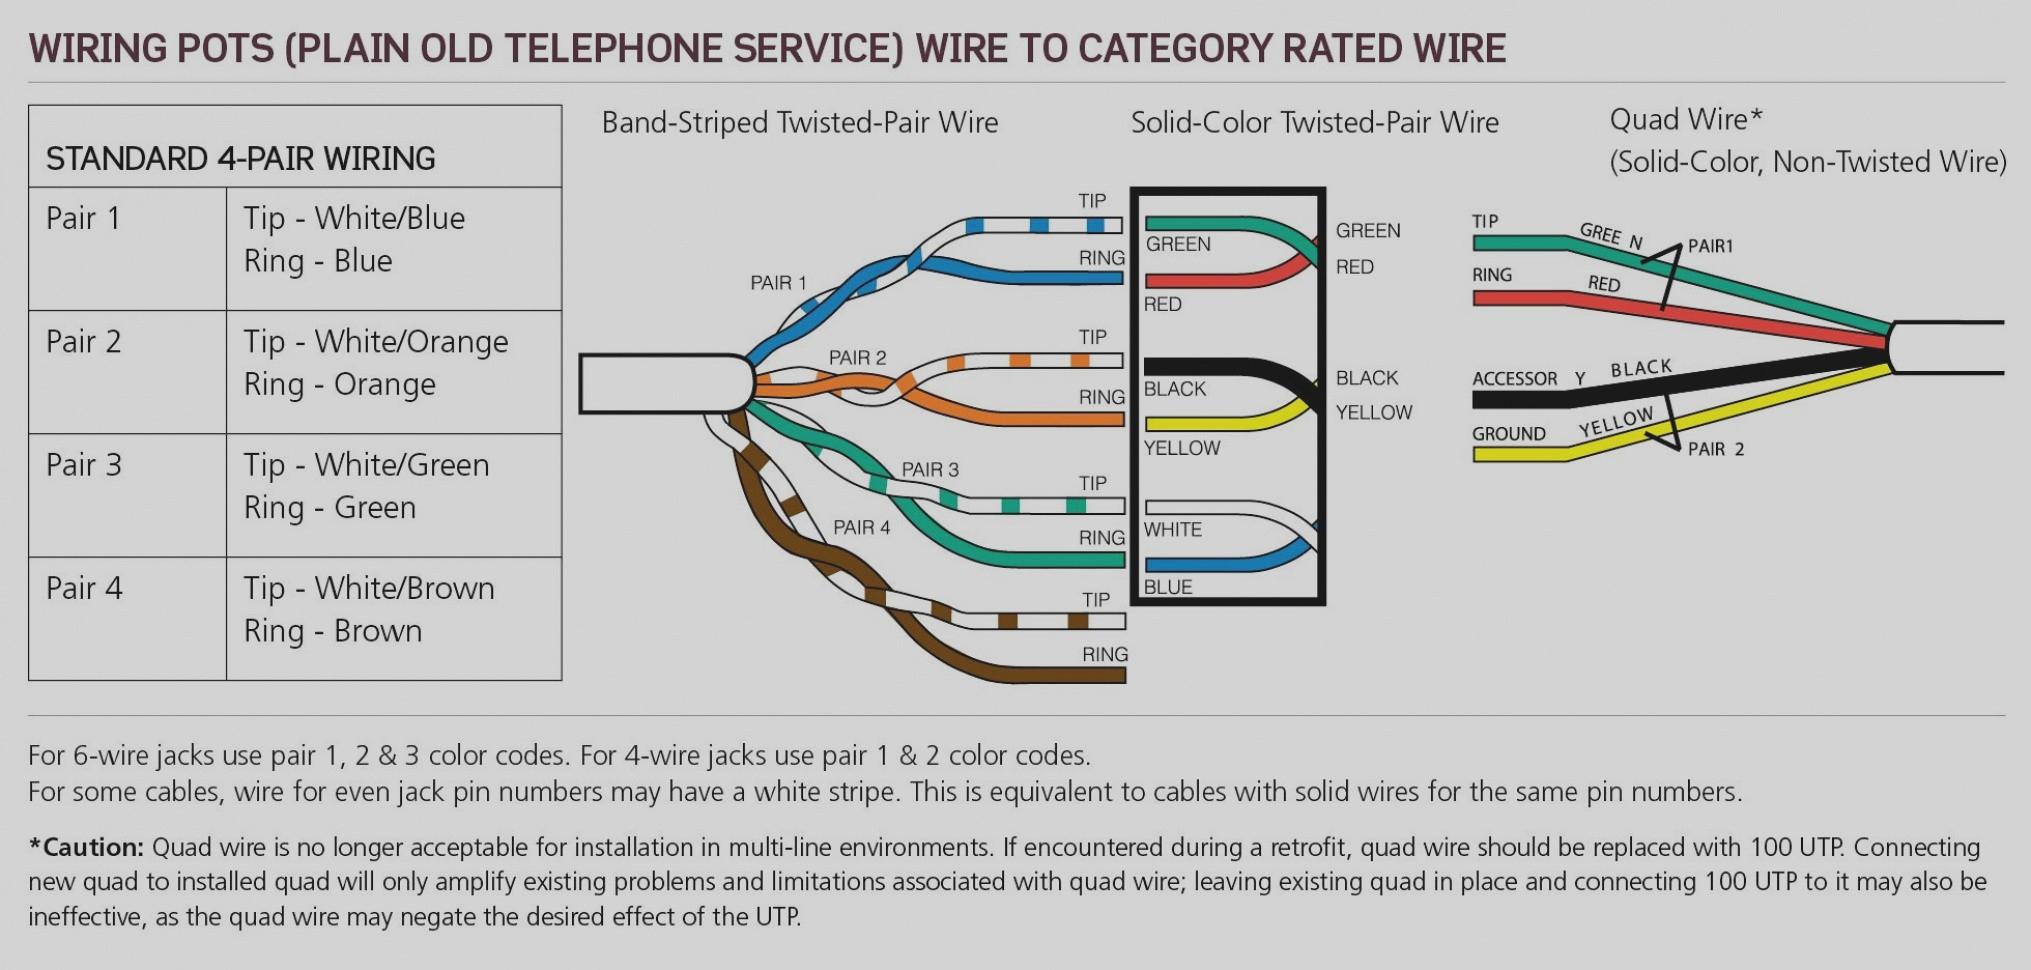 Rj11 Pin Diagram - Wiring Diagram Data Oreo - Rj45 To Rj11 Wiring Diagram